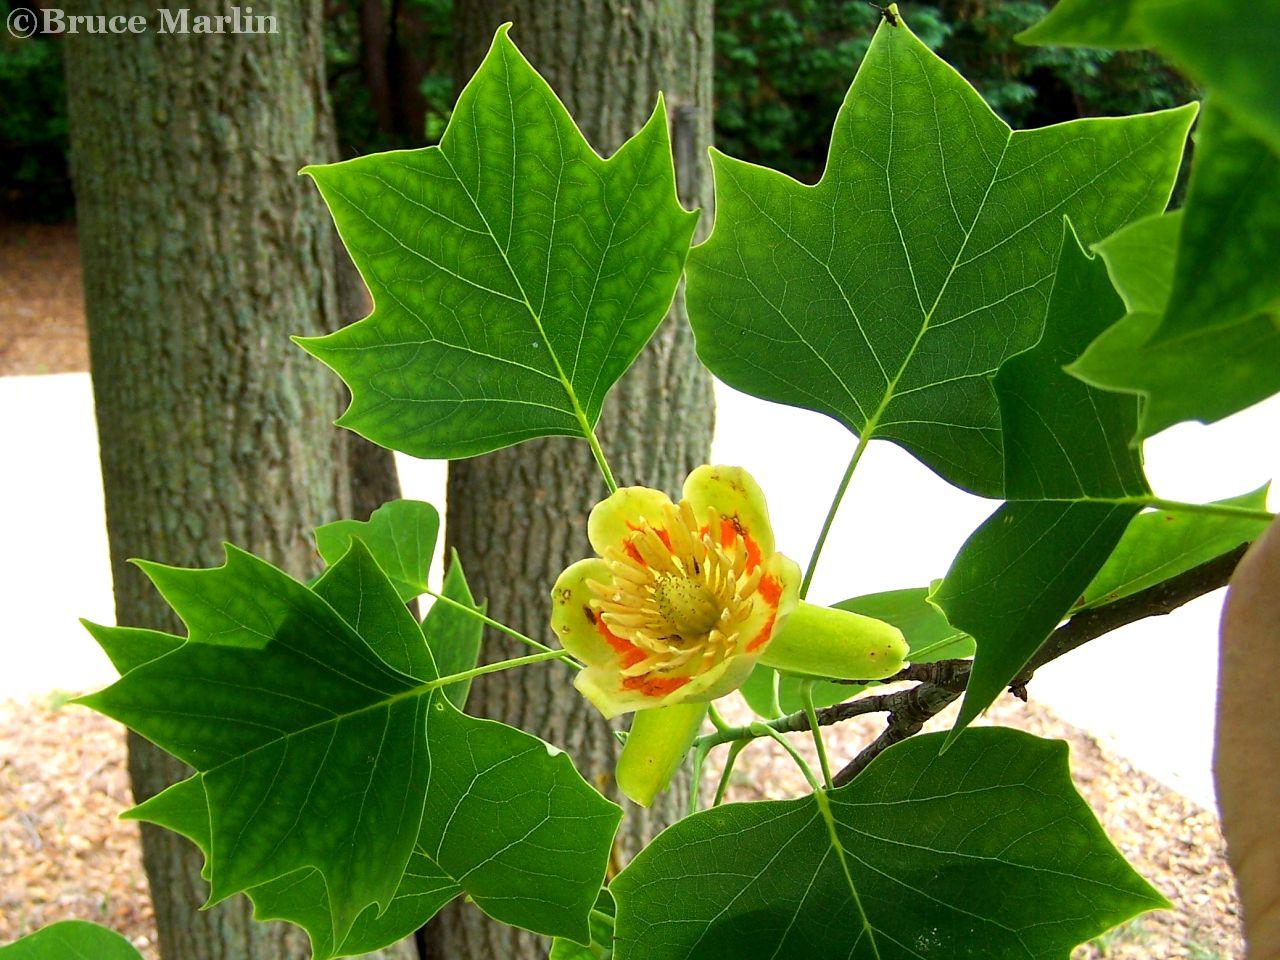 Magnolia Family; Tuliptree flower & foliage